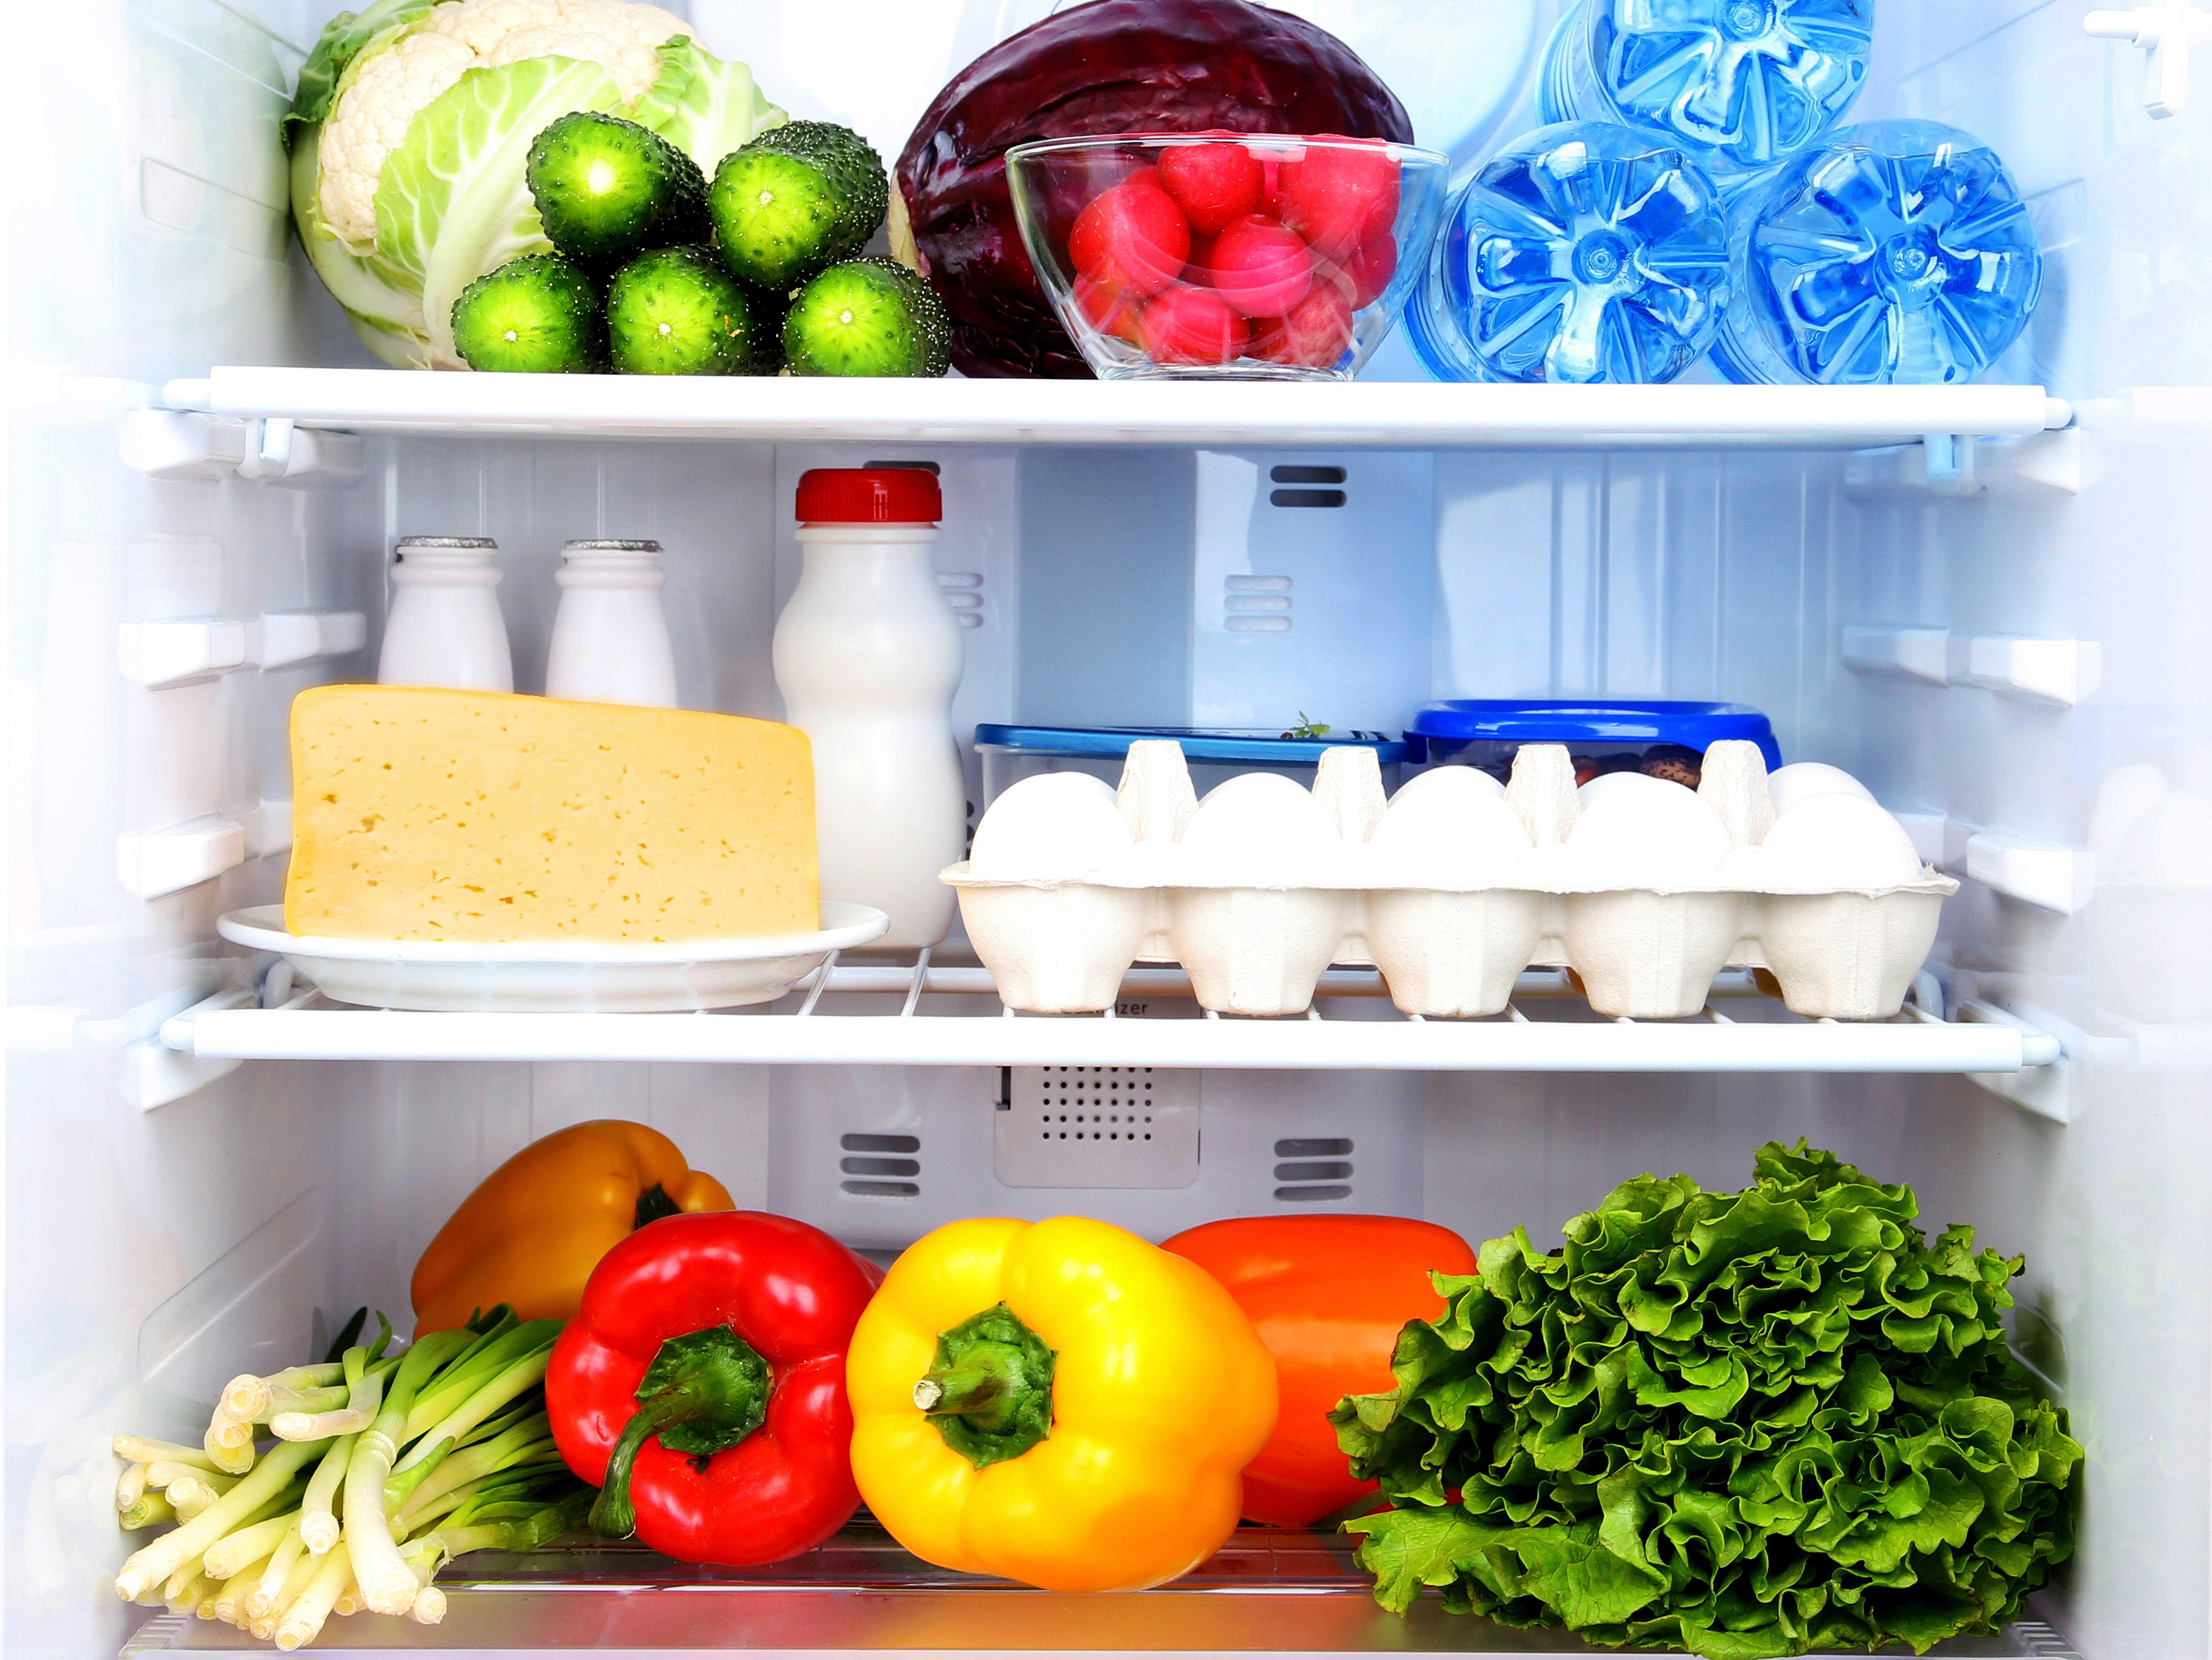 blog items you should never refrigerate home appliances